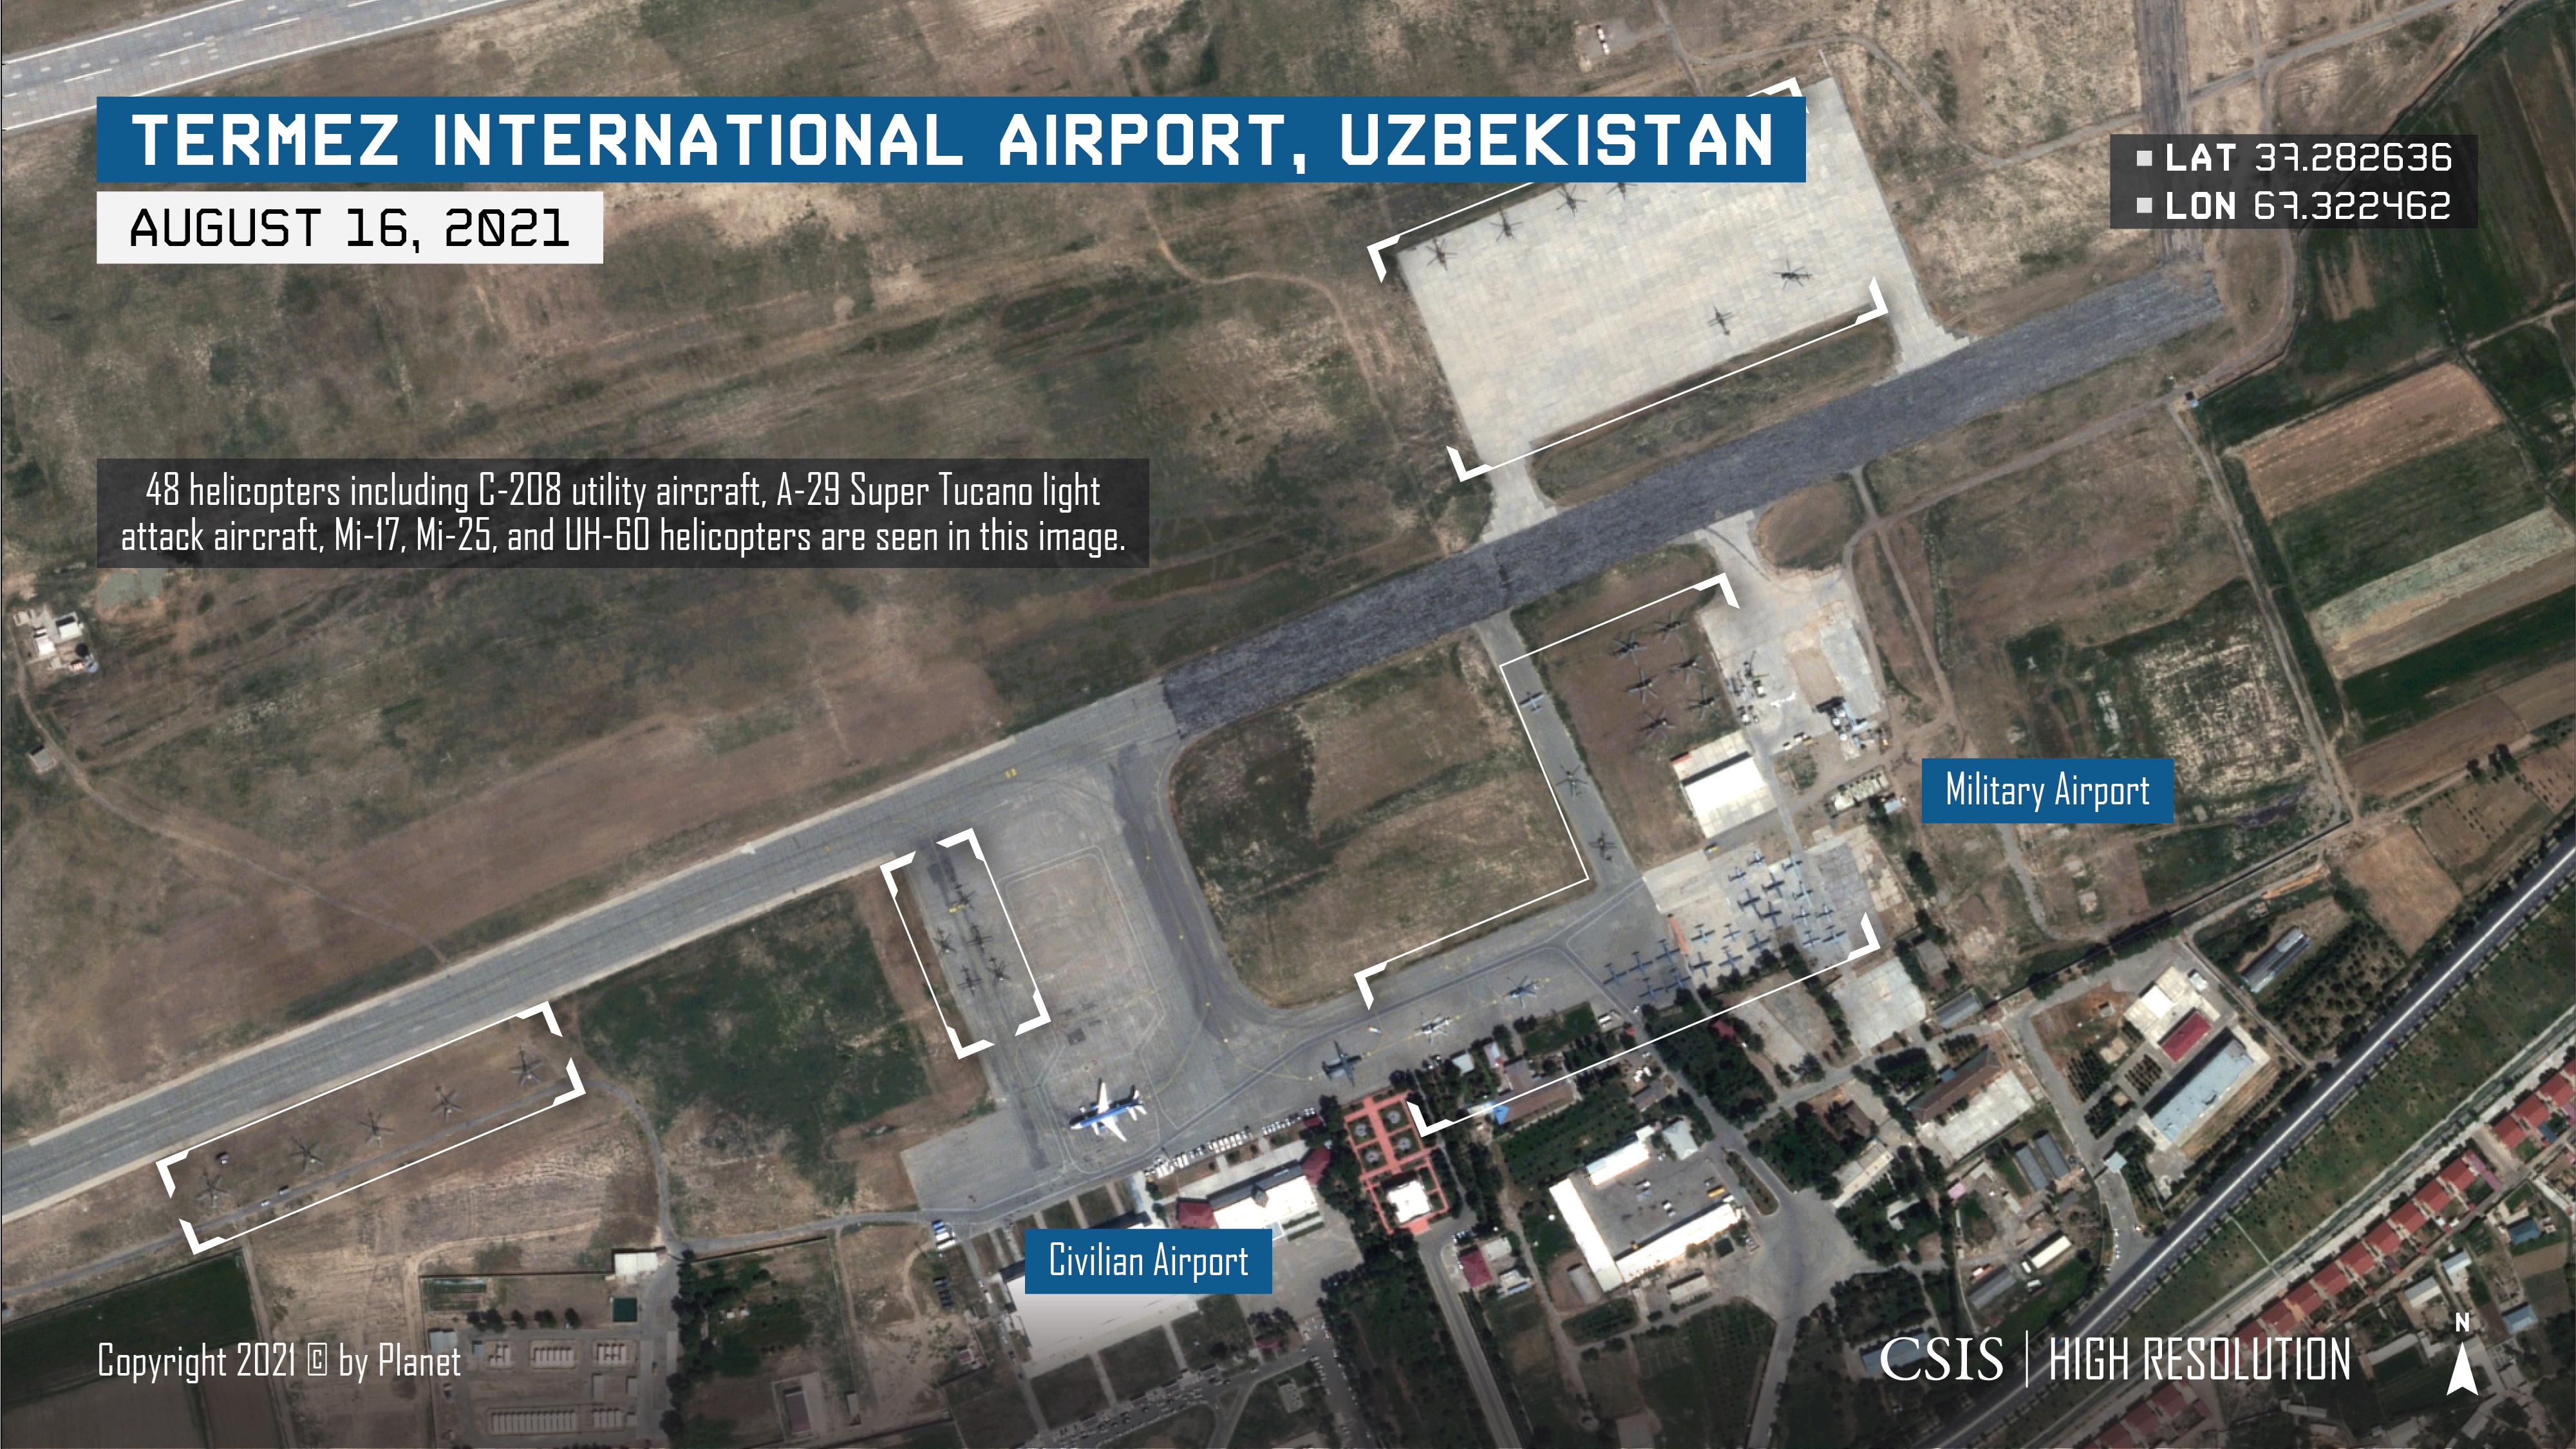 https://csis-website-prod.s3.amazonaws.com/s3fs-public/210826_Termez_Airport_1.jpg?wCk1fnYigJz0iIL6fhClOEtSF1L6W_SX